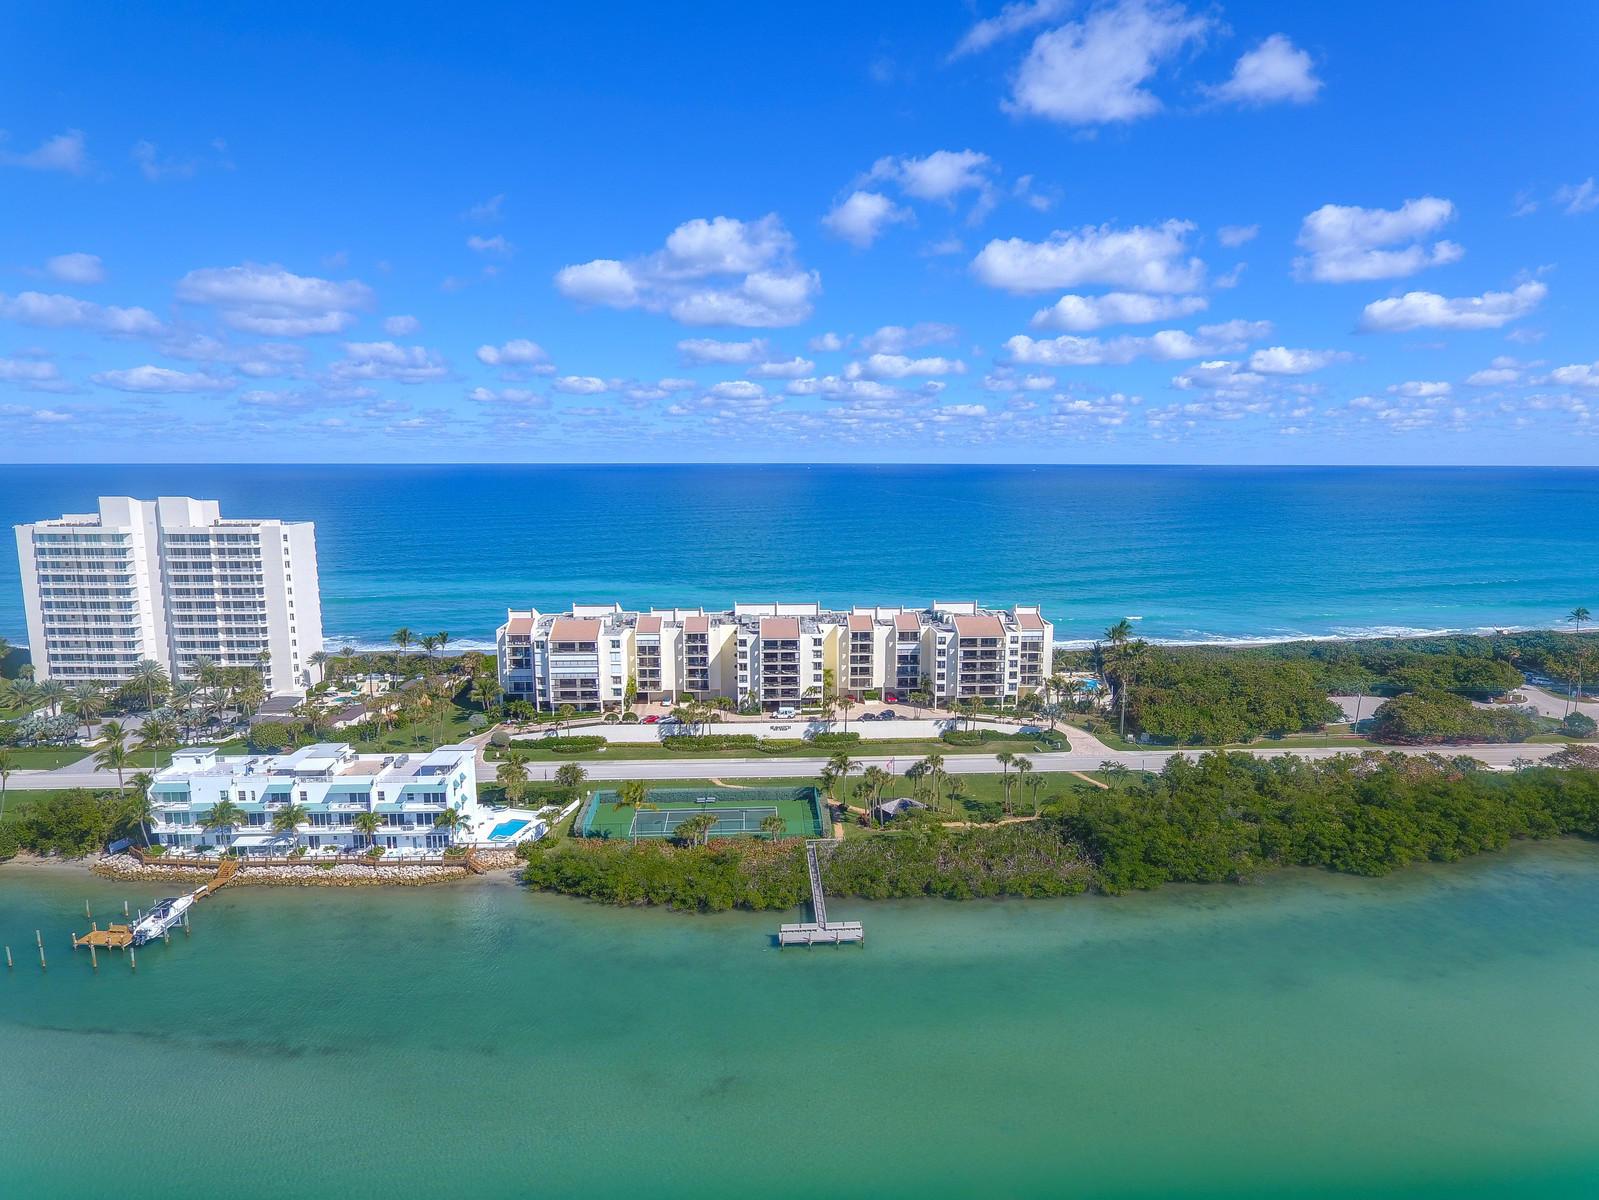 TEQUESTA FLORIDA